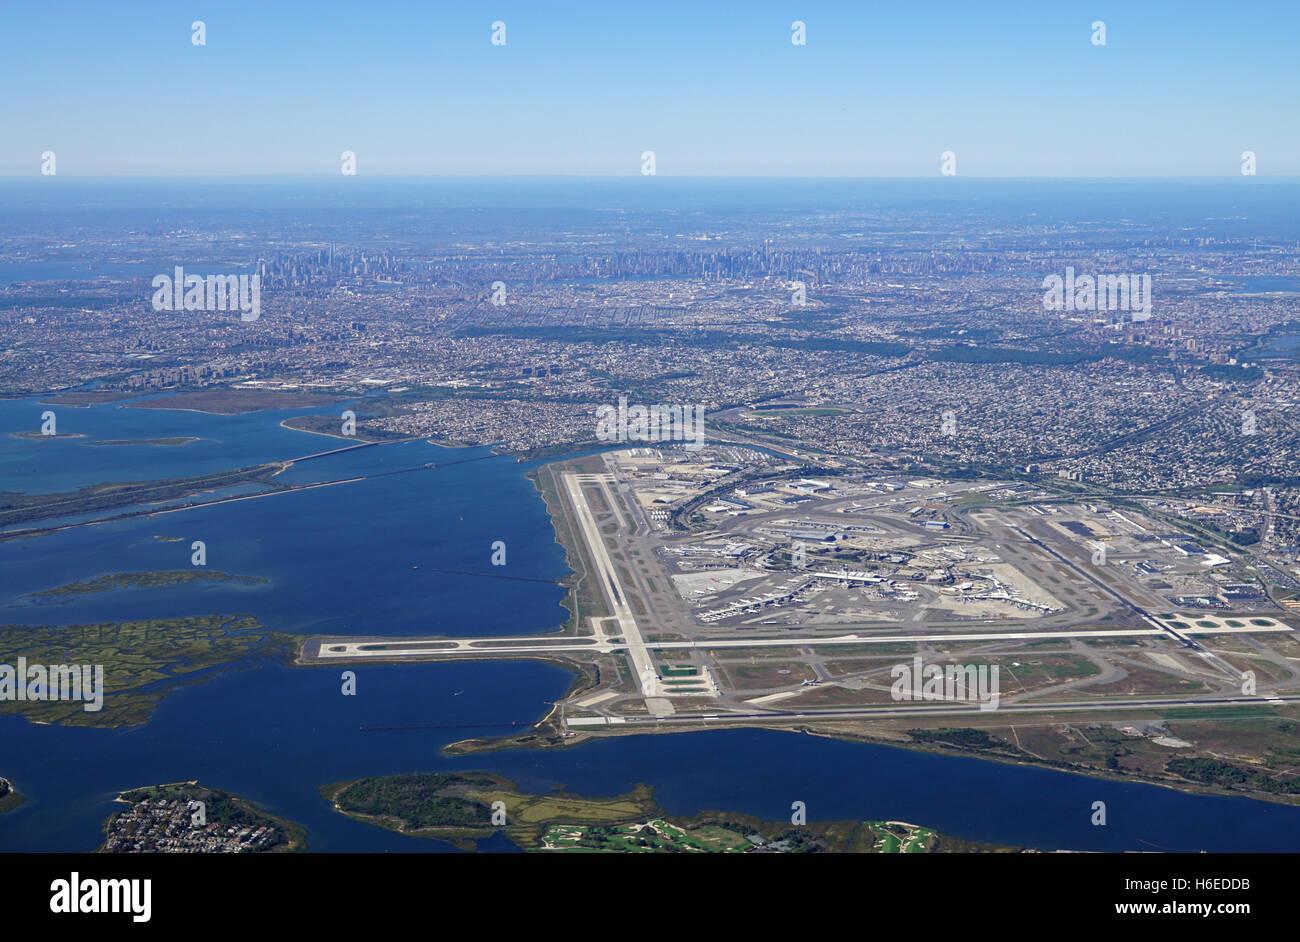 Aeroporto New York John F Kennedy : Aerial view of the john f kennedy international airport